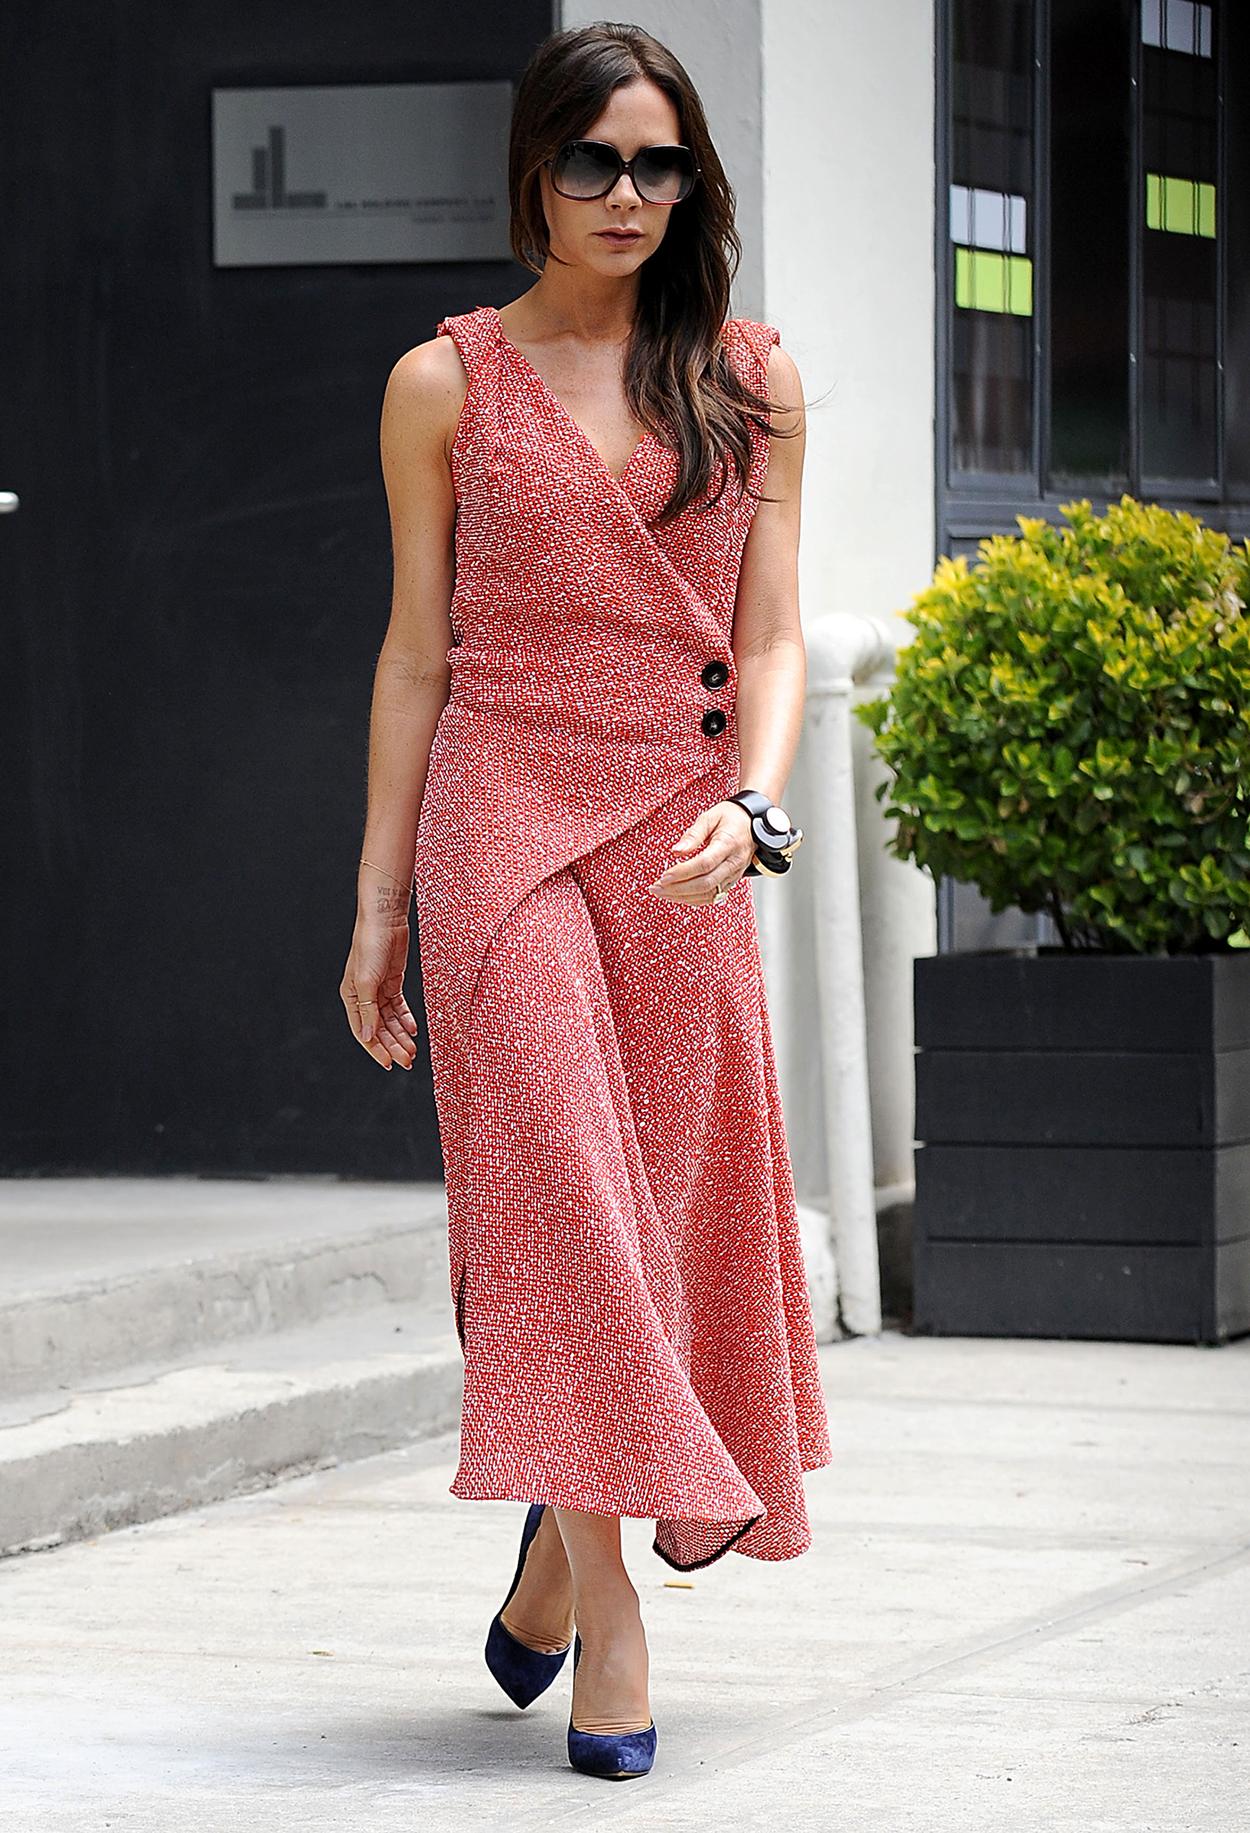 Victoria Beckham Posh Style Fashion Etc Petocuri